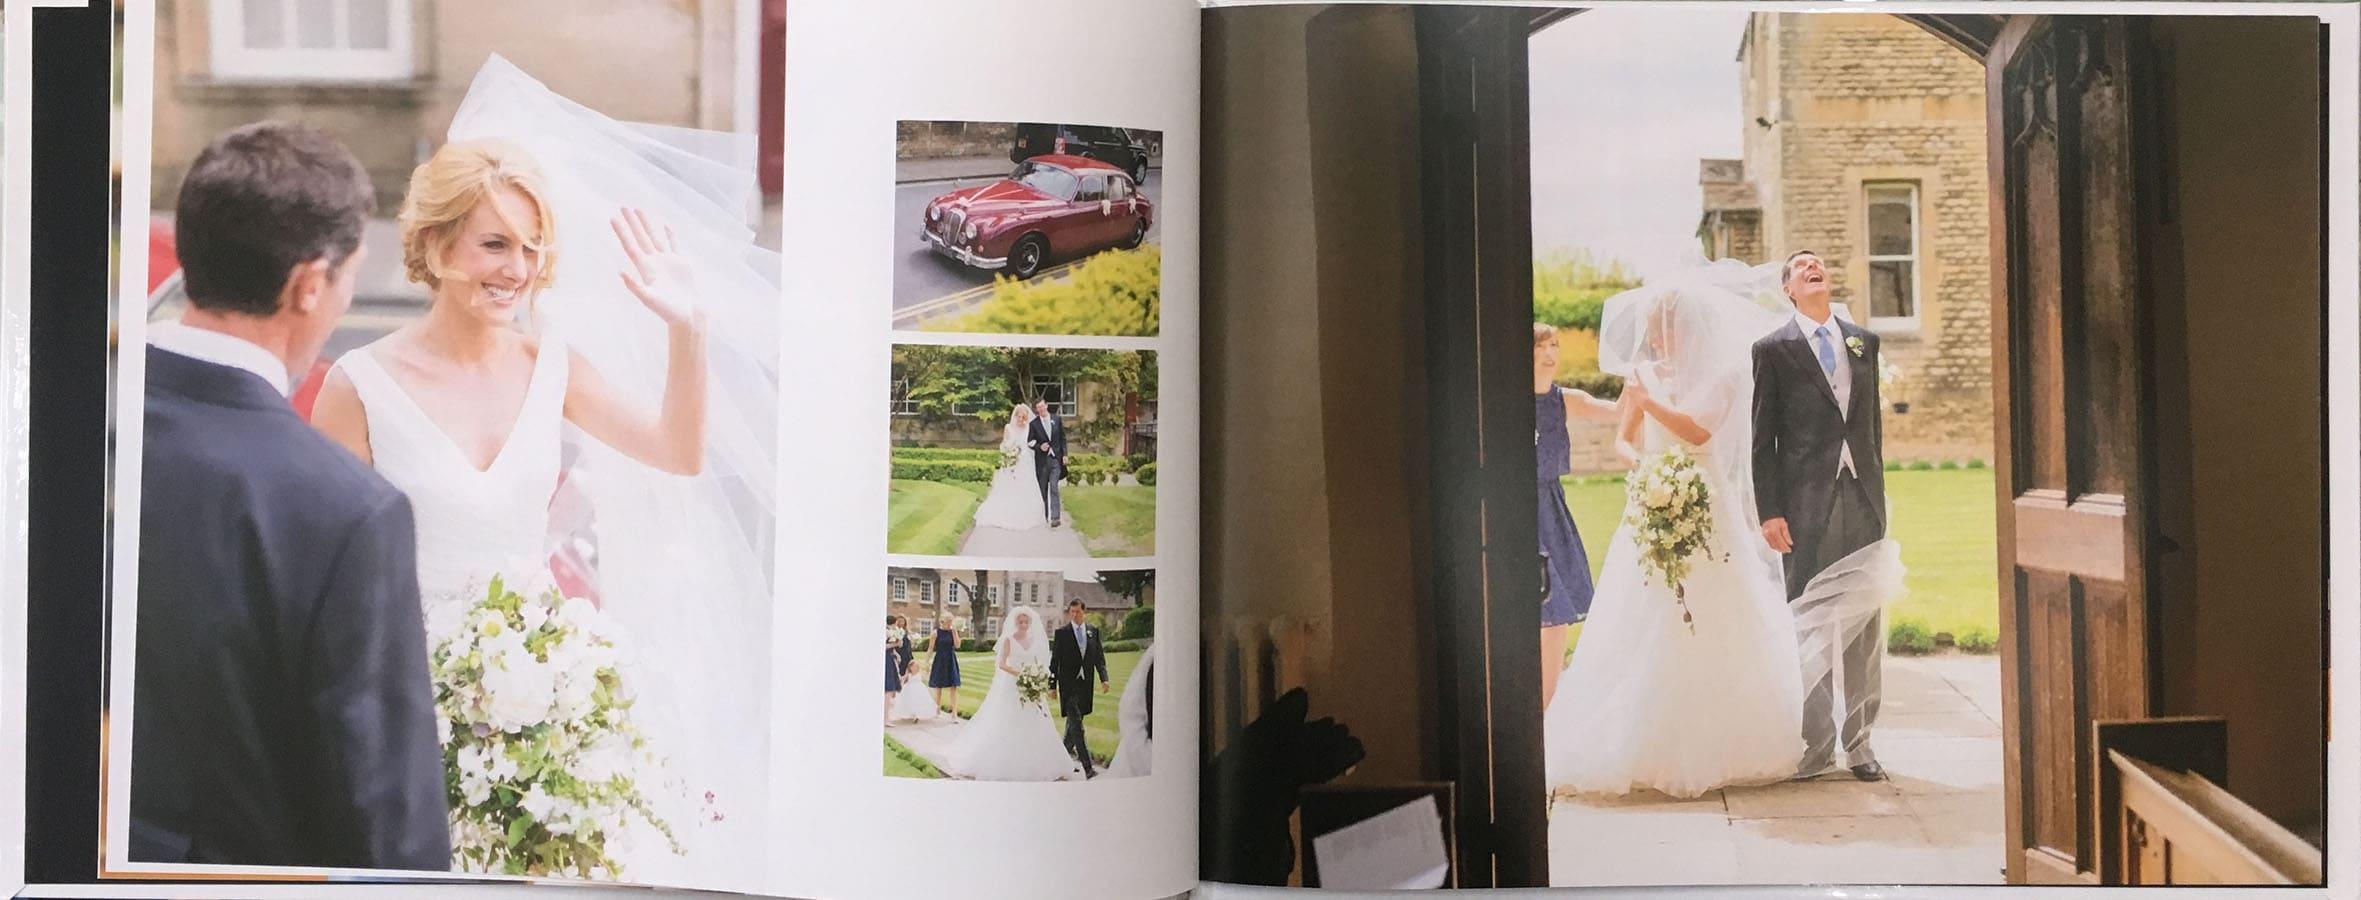 Photobook-wedding4